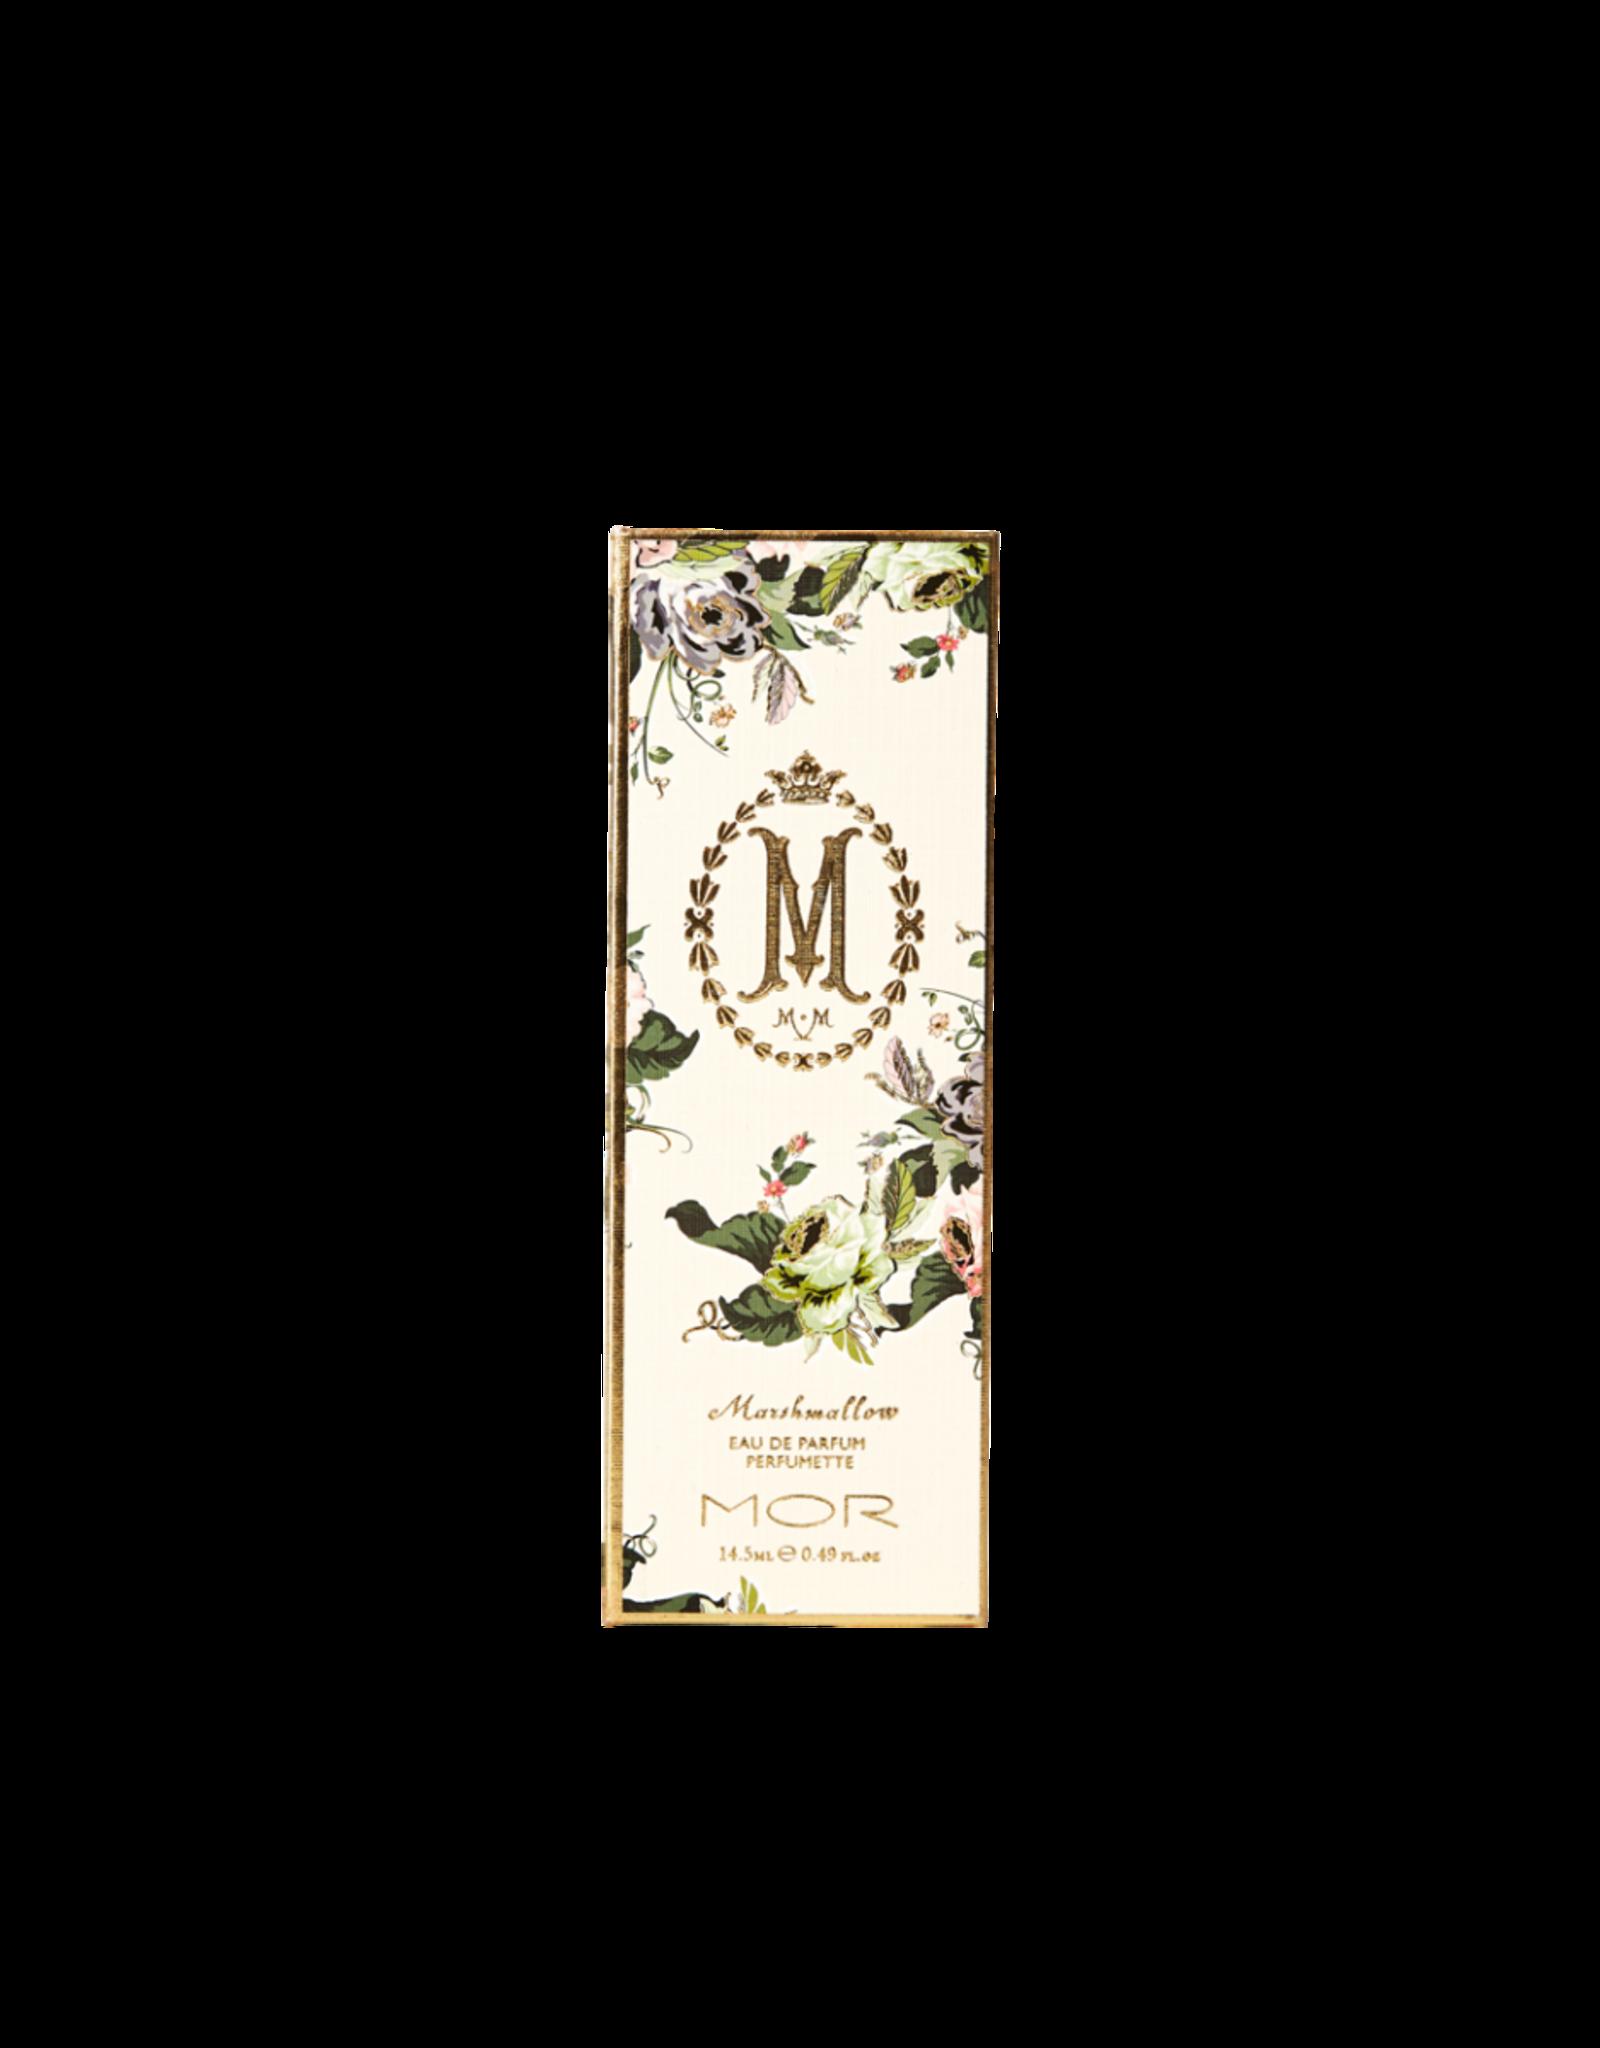 MOR AUSTRALIA Marshmallow Eau De Parfumette14.5ml